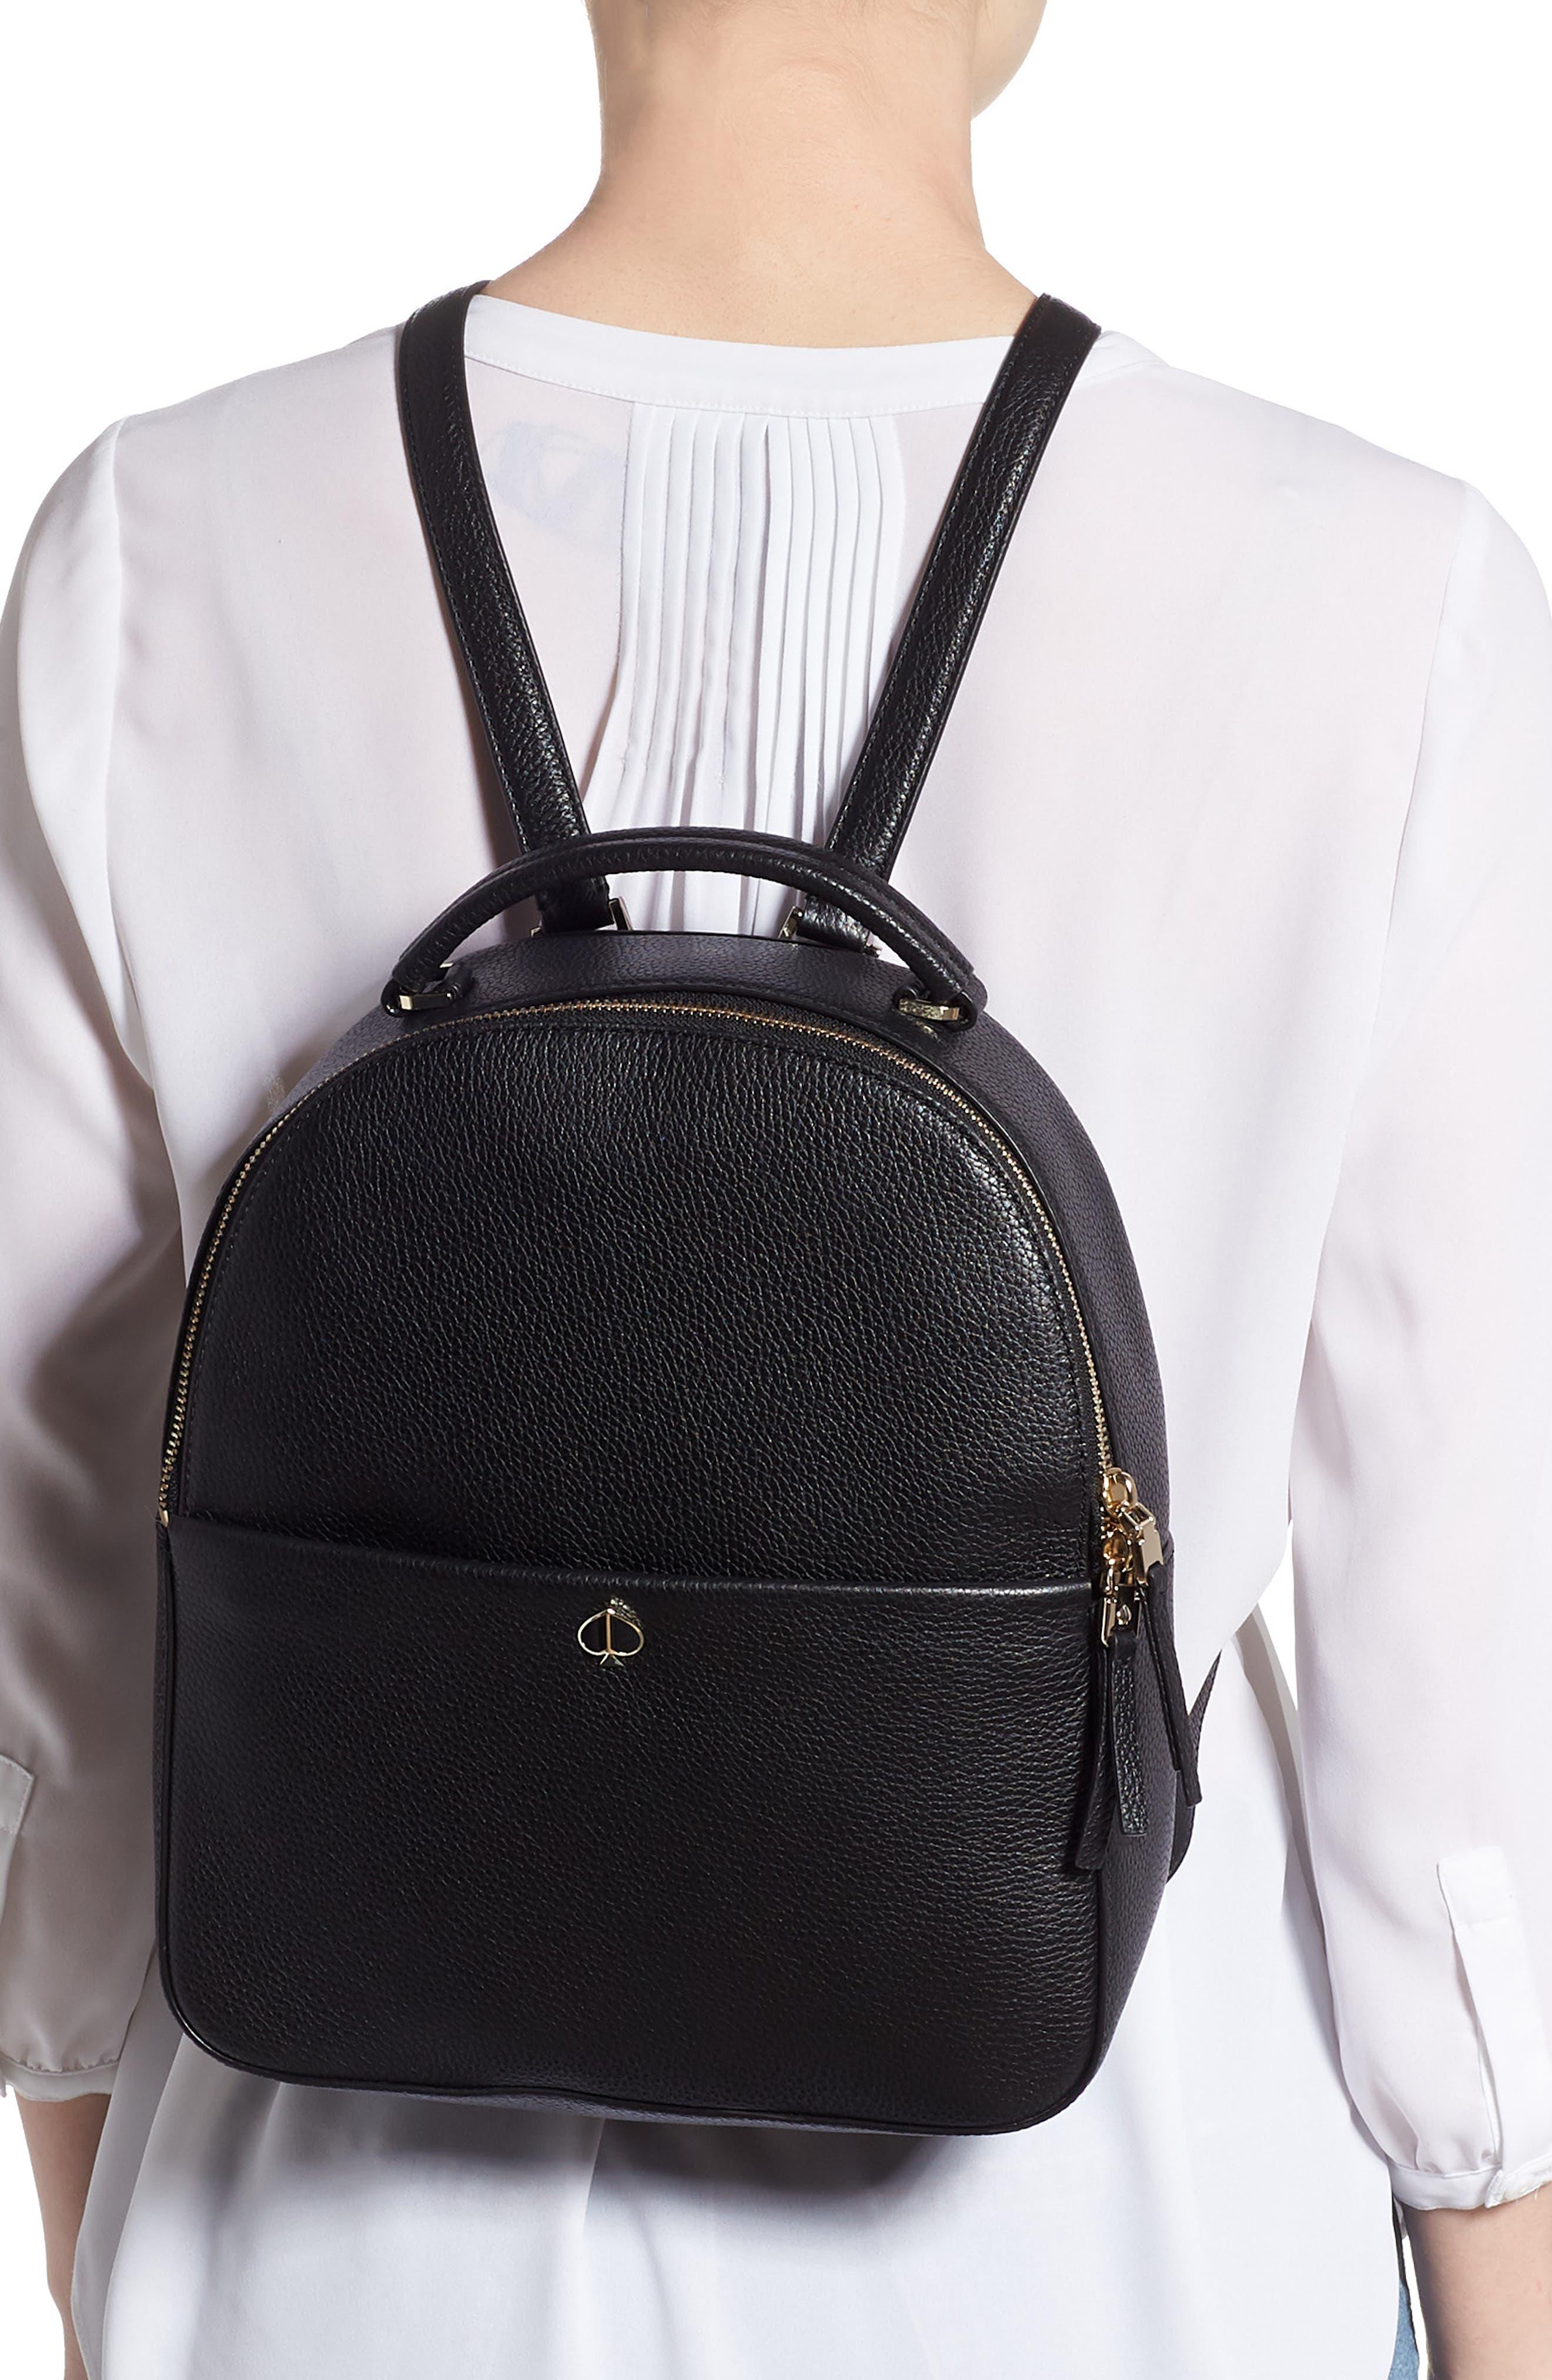 KATE SPADE NEW YORK, medium polly leather backpack, Alternate thumbnail 2, color, BLACK